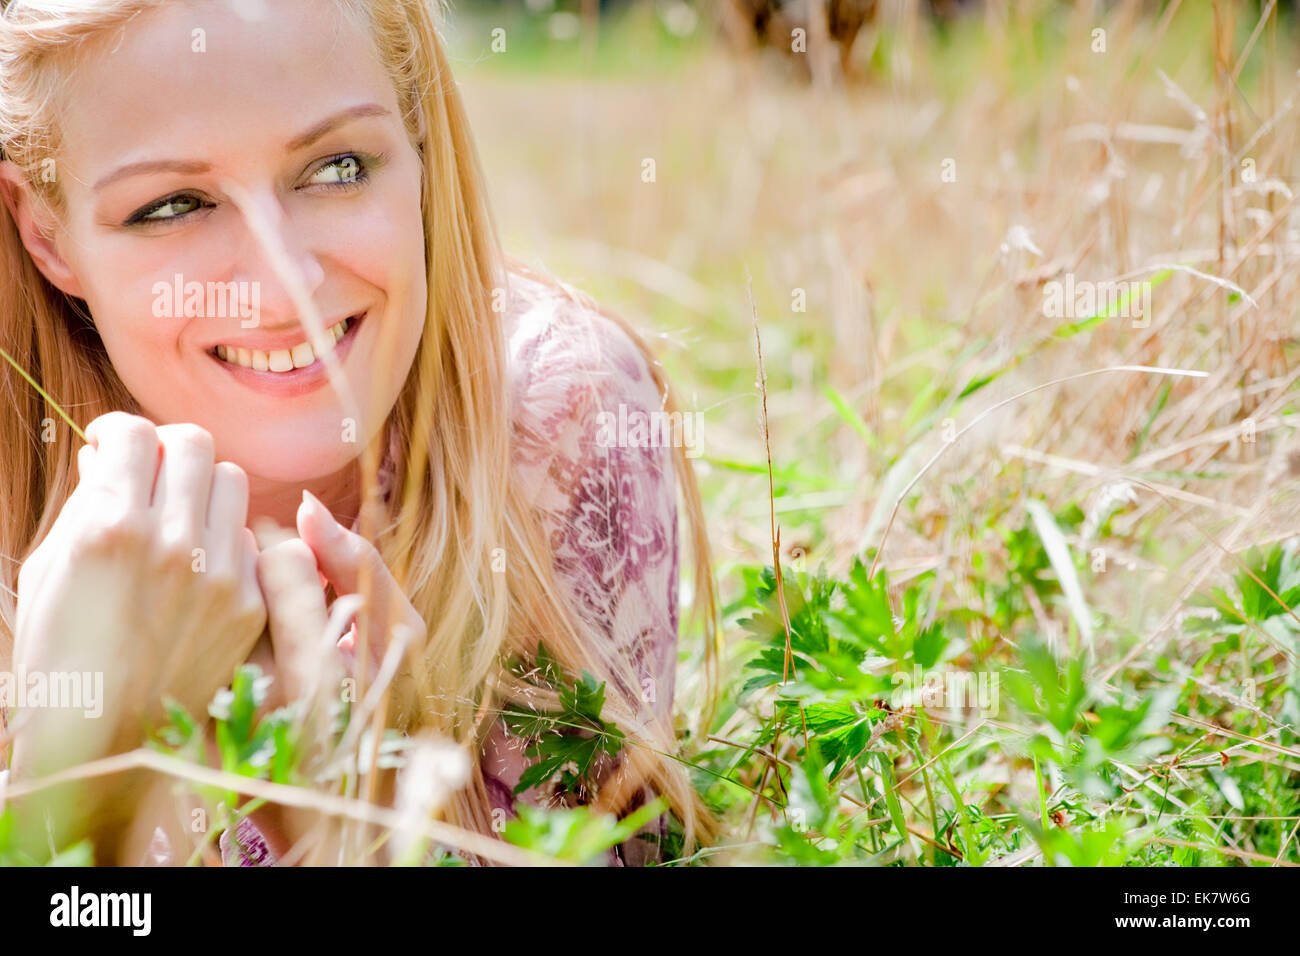 Happy lifestyle girl - Stock Image